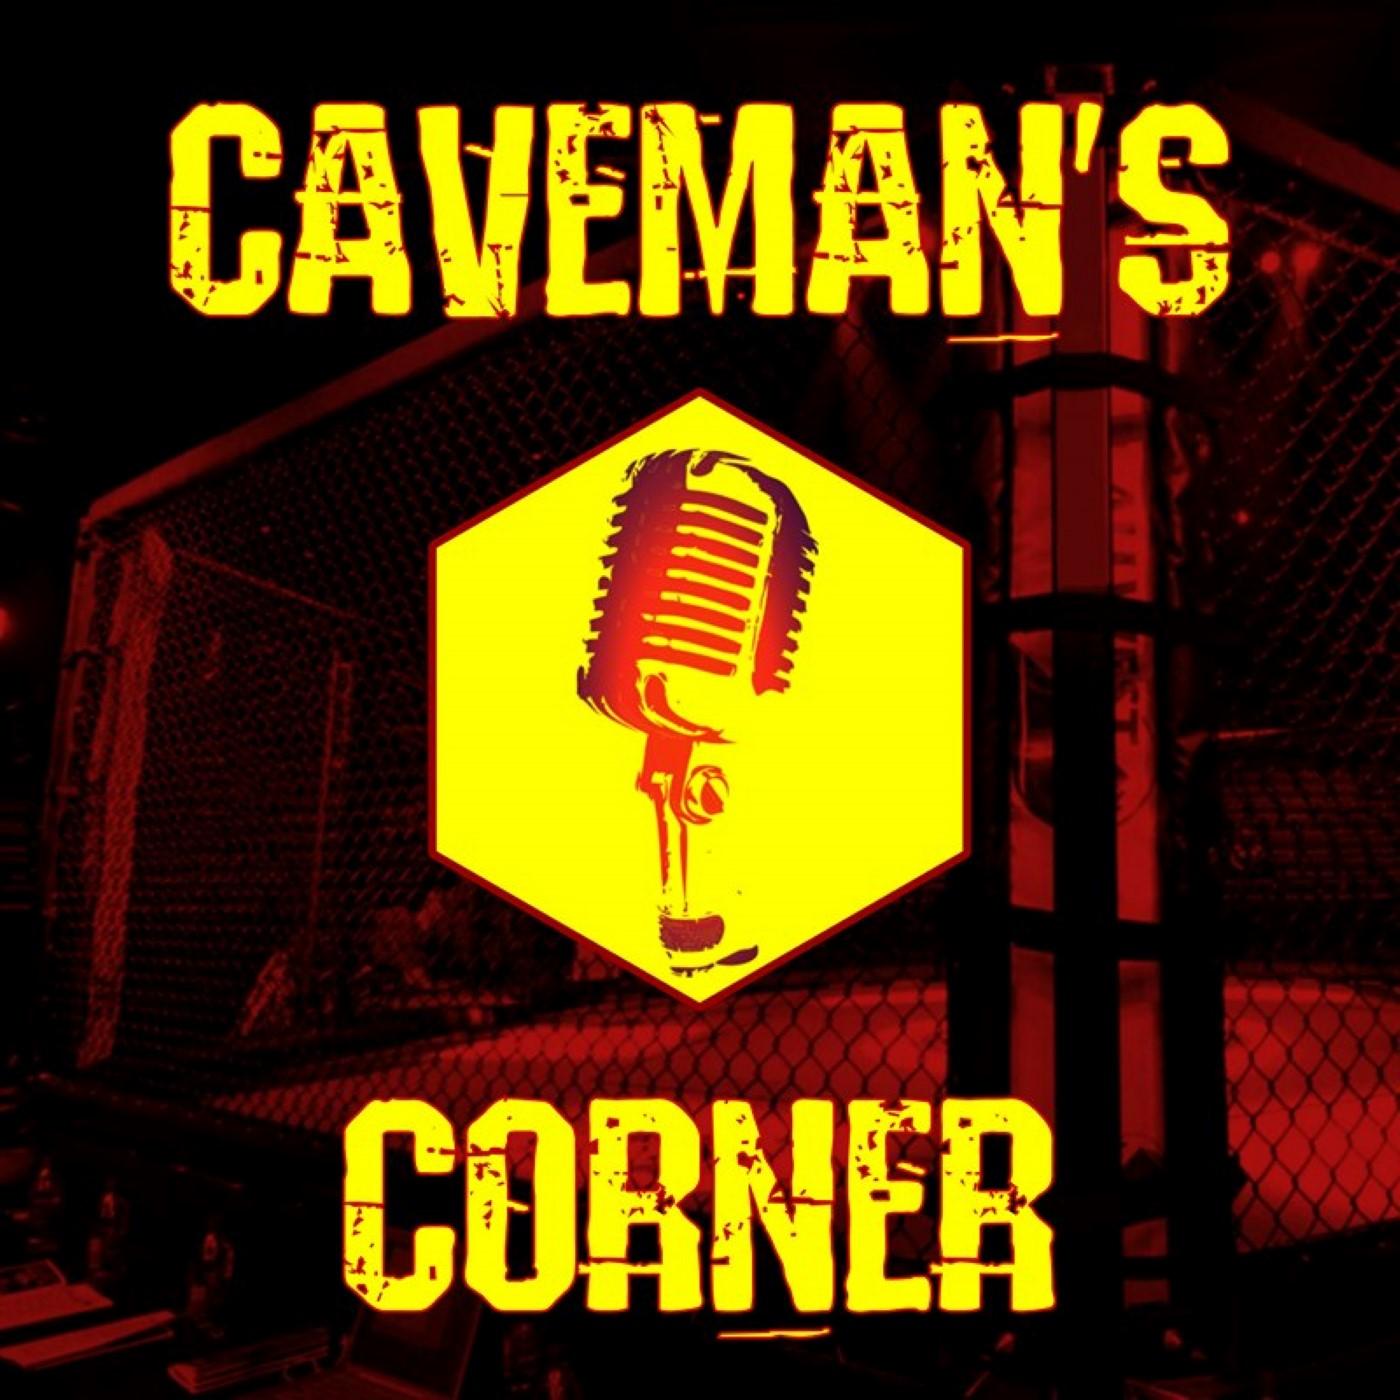 Caveman's Corner